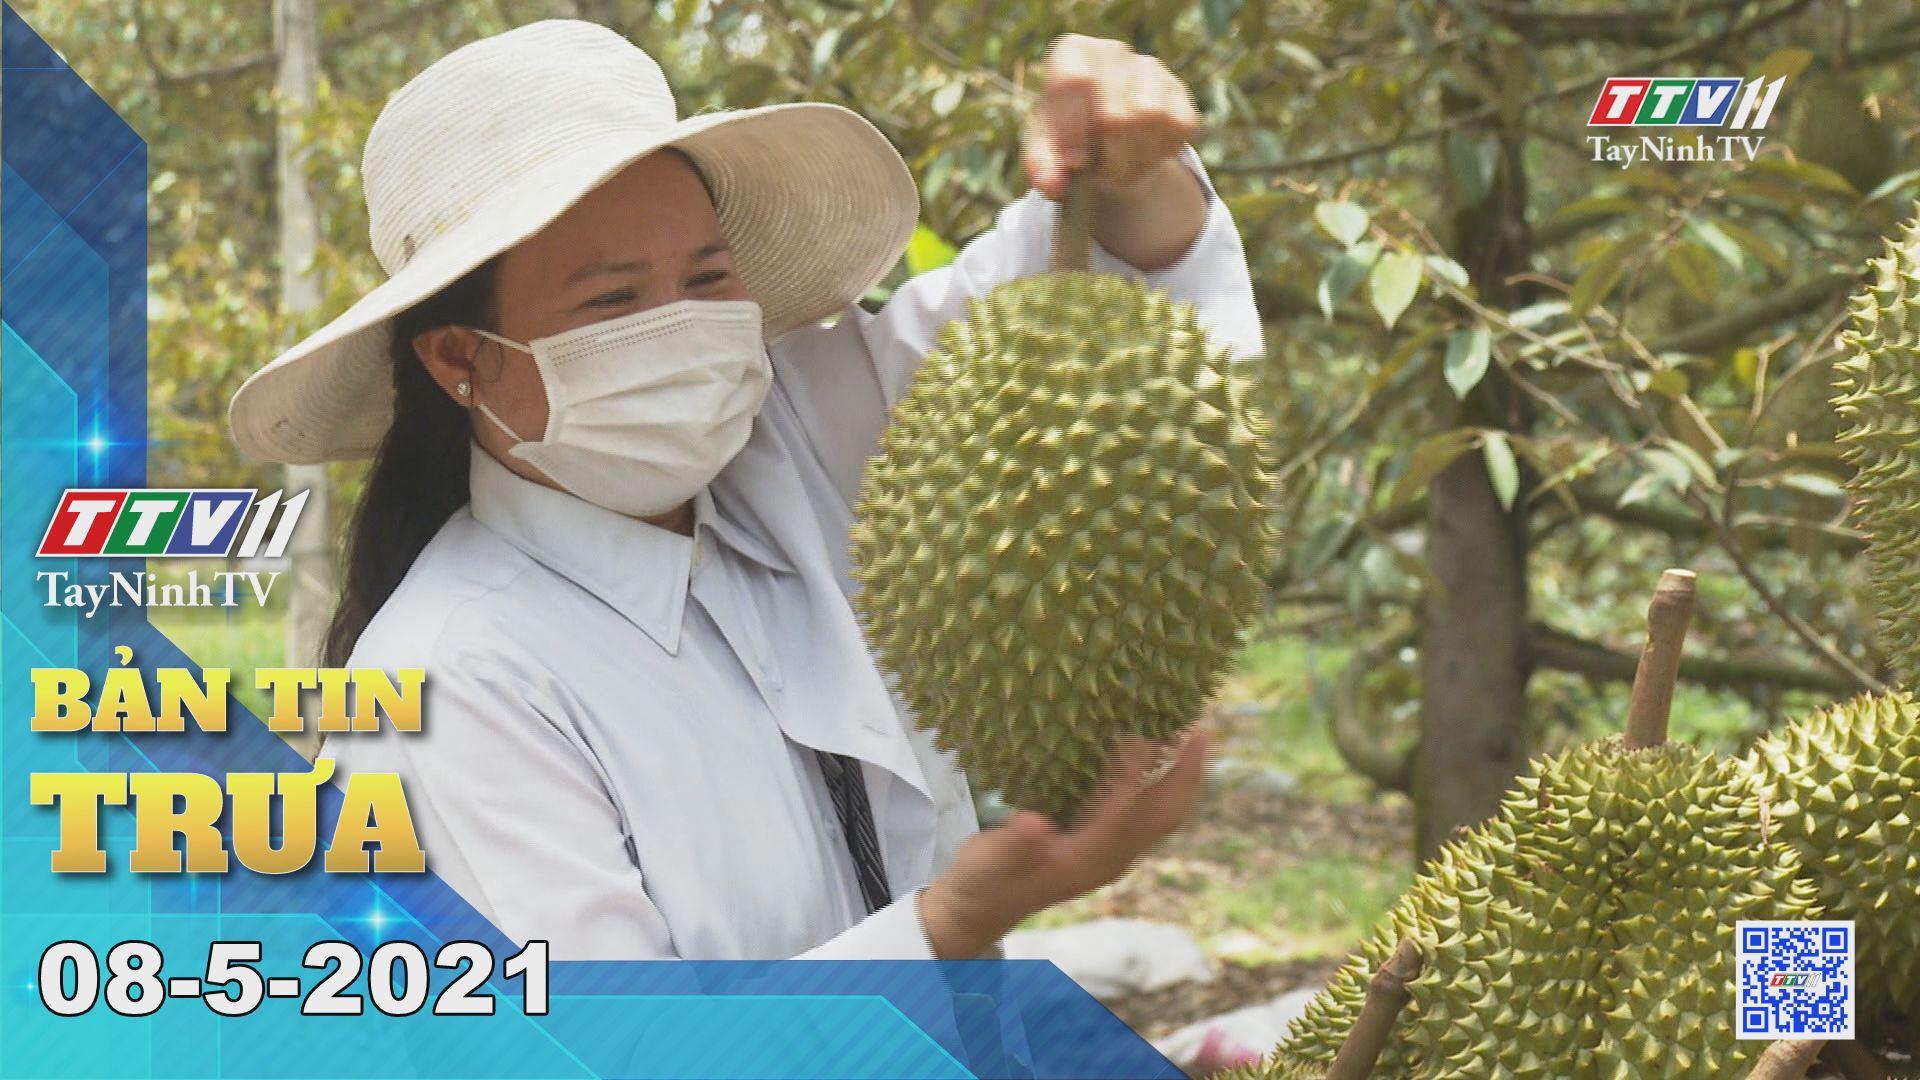 Bản tin trưa 08-5-2021 | Tin tức hôm nay | TayNinhTV